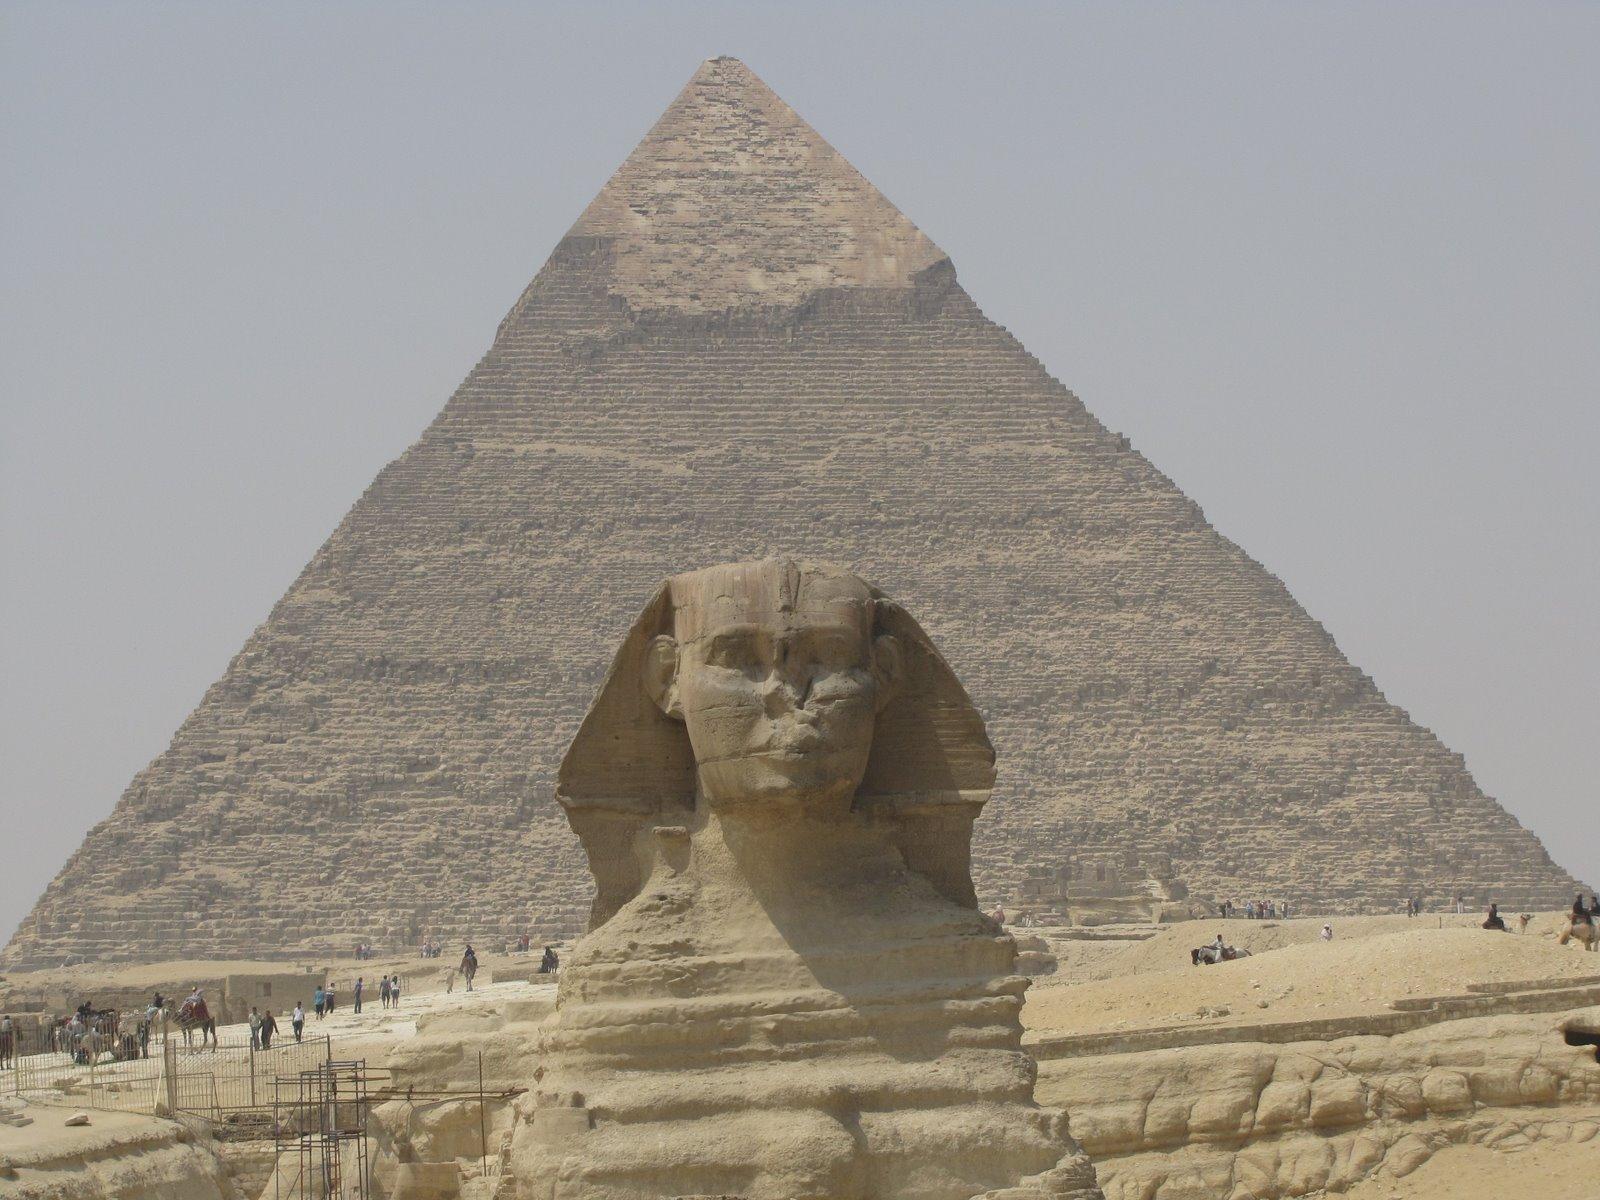 egypt pyramids sphinx inside - photo #14